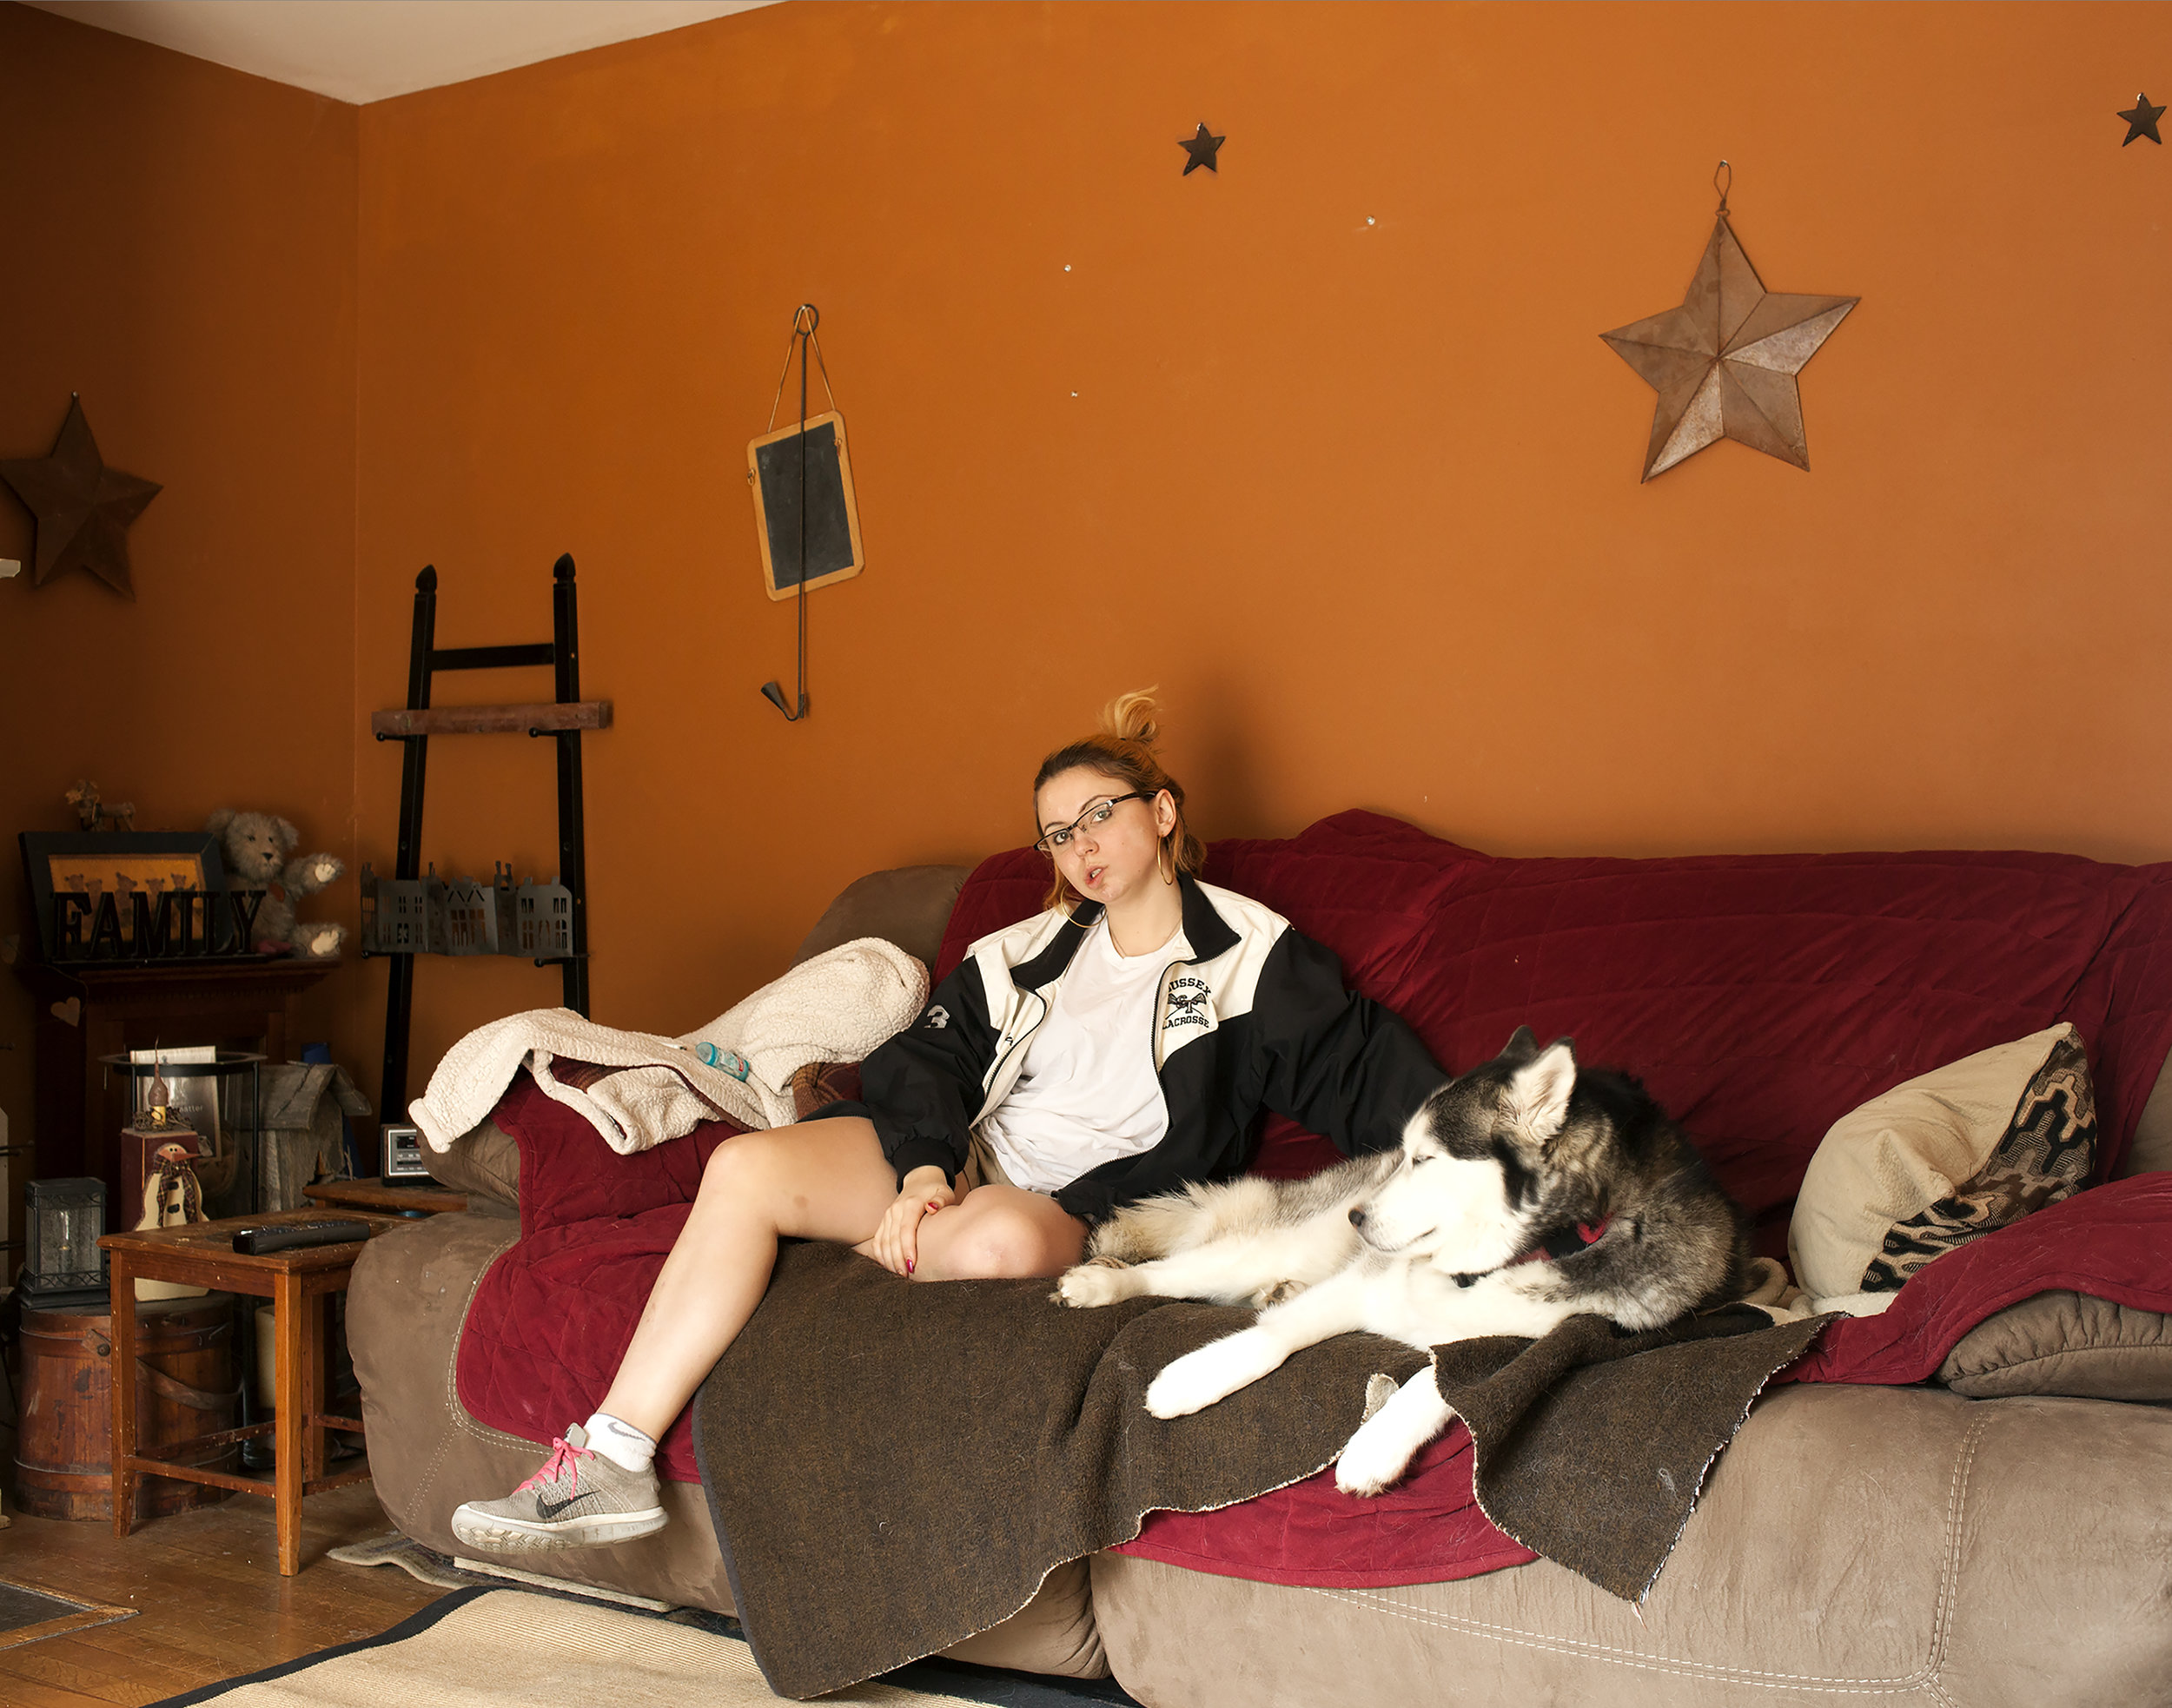 golacinski_on_couch copy.jpg